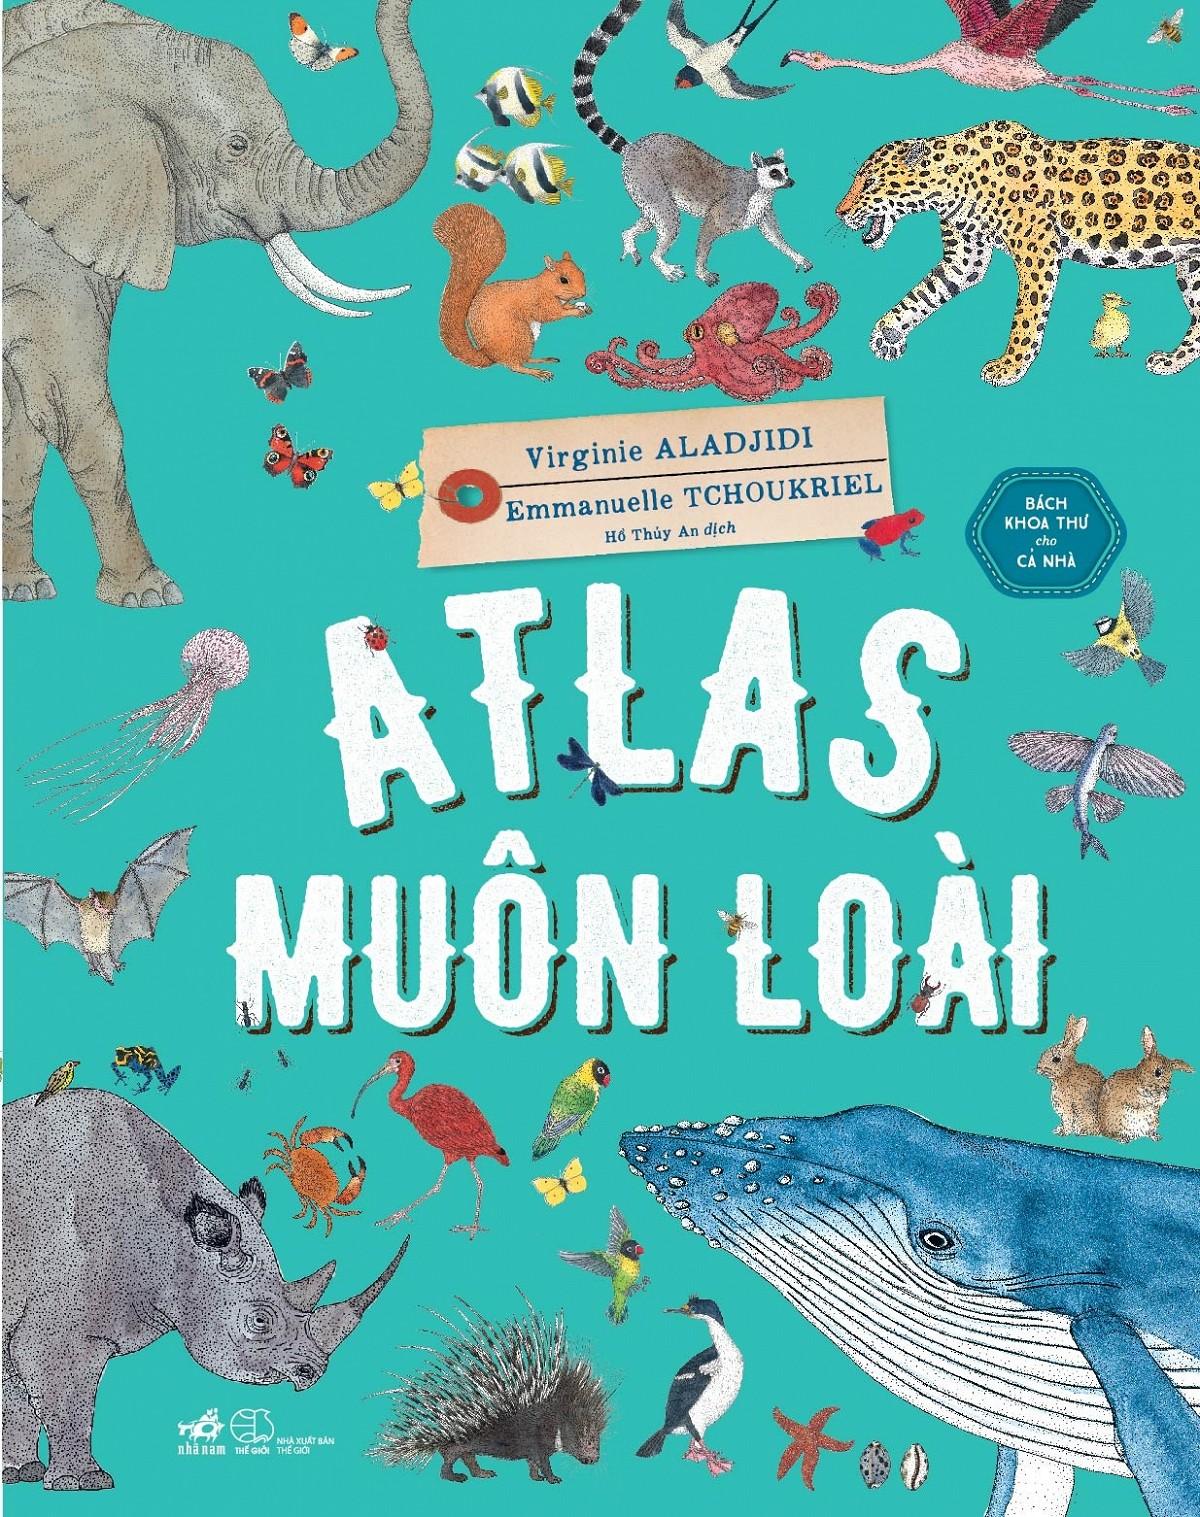 atlas-muon-loai.u547.d20170222.t083033.470385.jpg